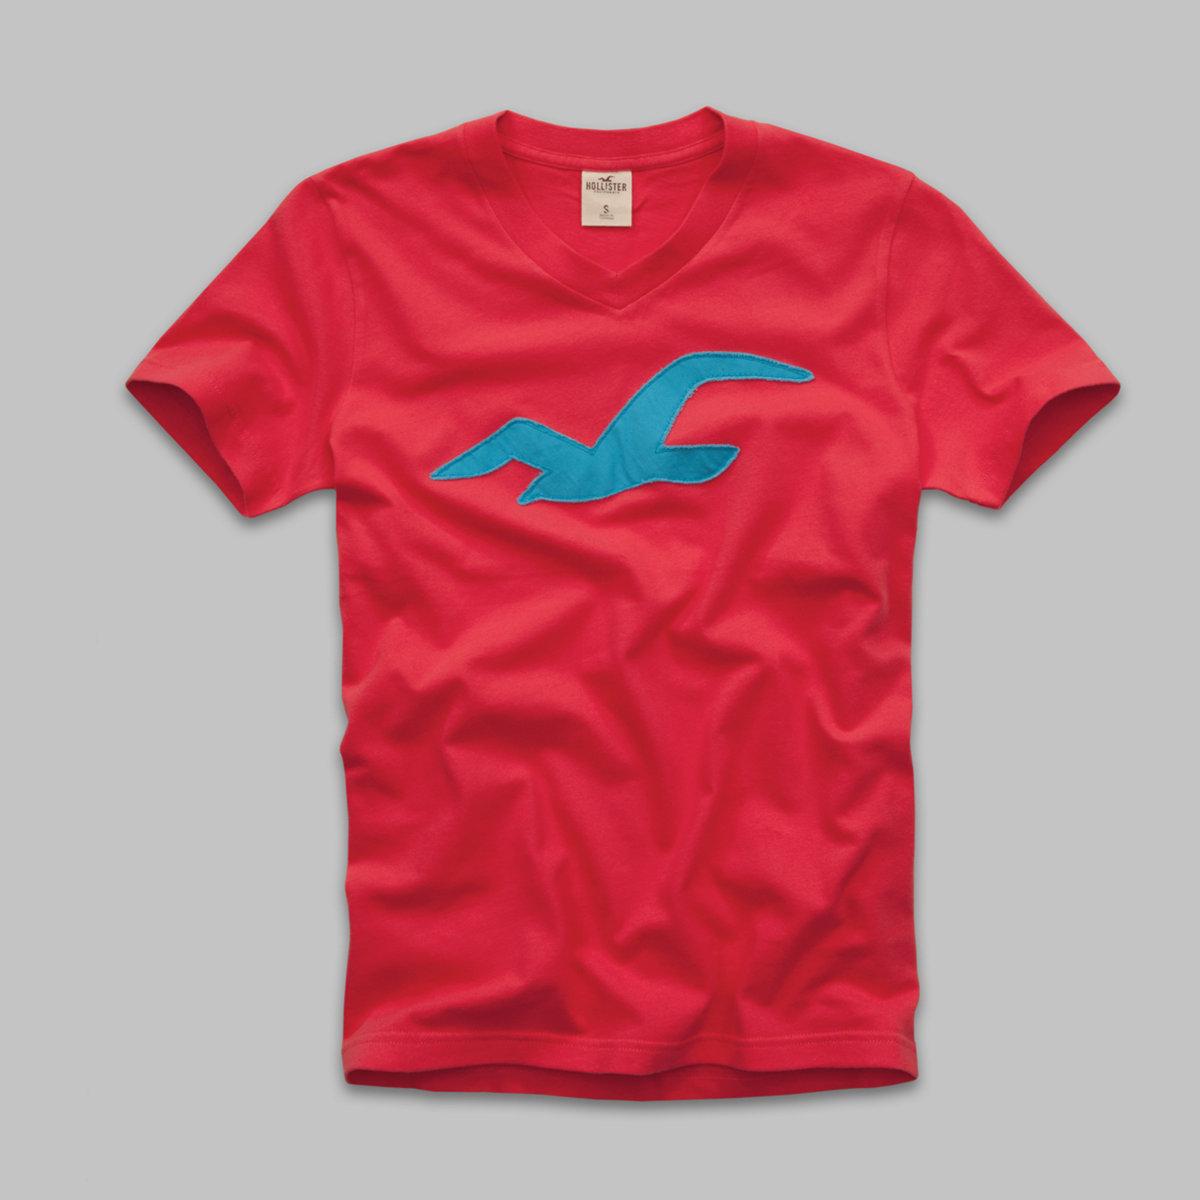 Tamarack V Neck T-Shirt